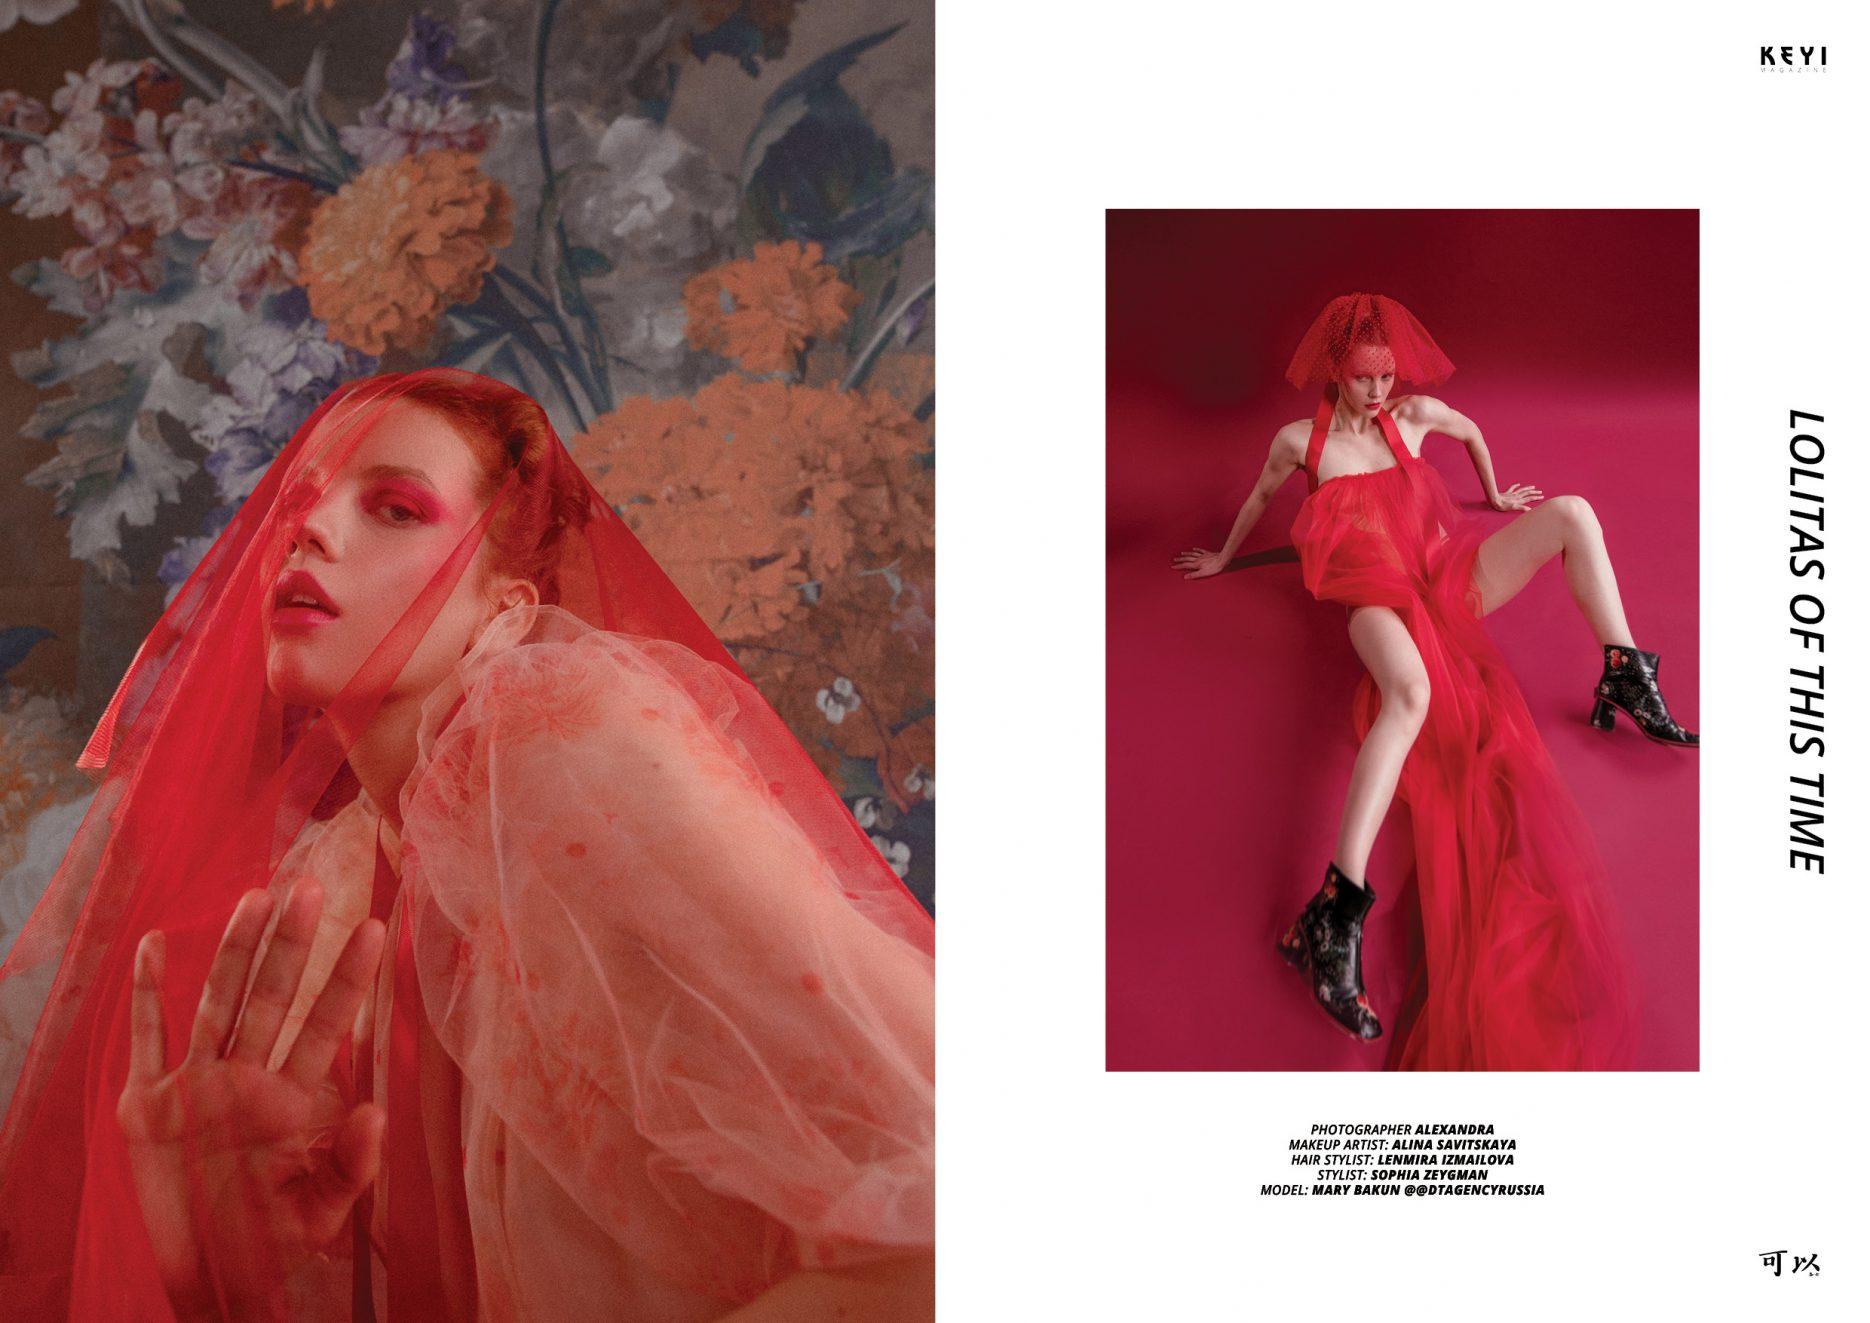 "Editorial Keyi Magazine ""Lolitas of this time"" by Alexandra Abramova with Mary Bakun and Mary Stepanova. Make up Alina Savitskaya and Maria Aleksina."